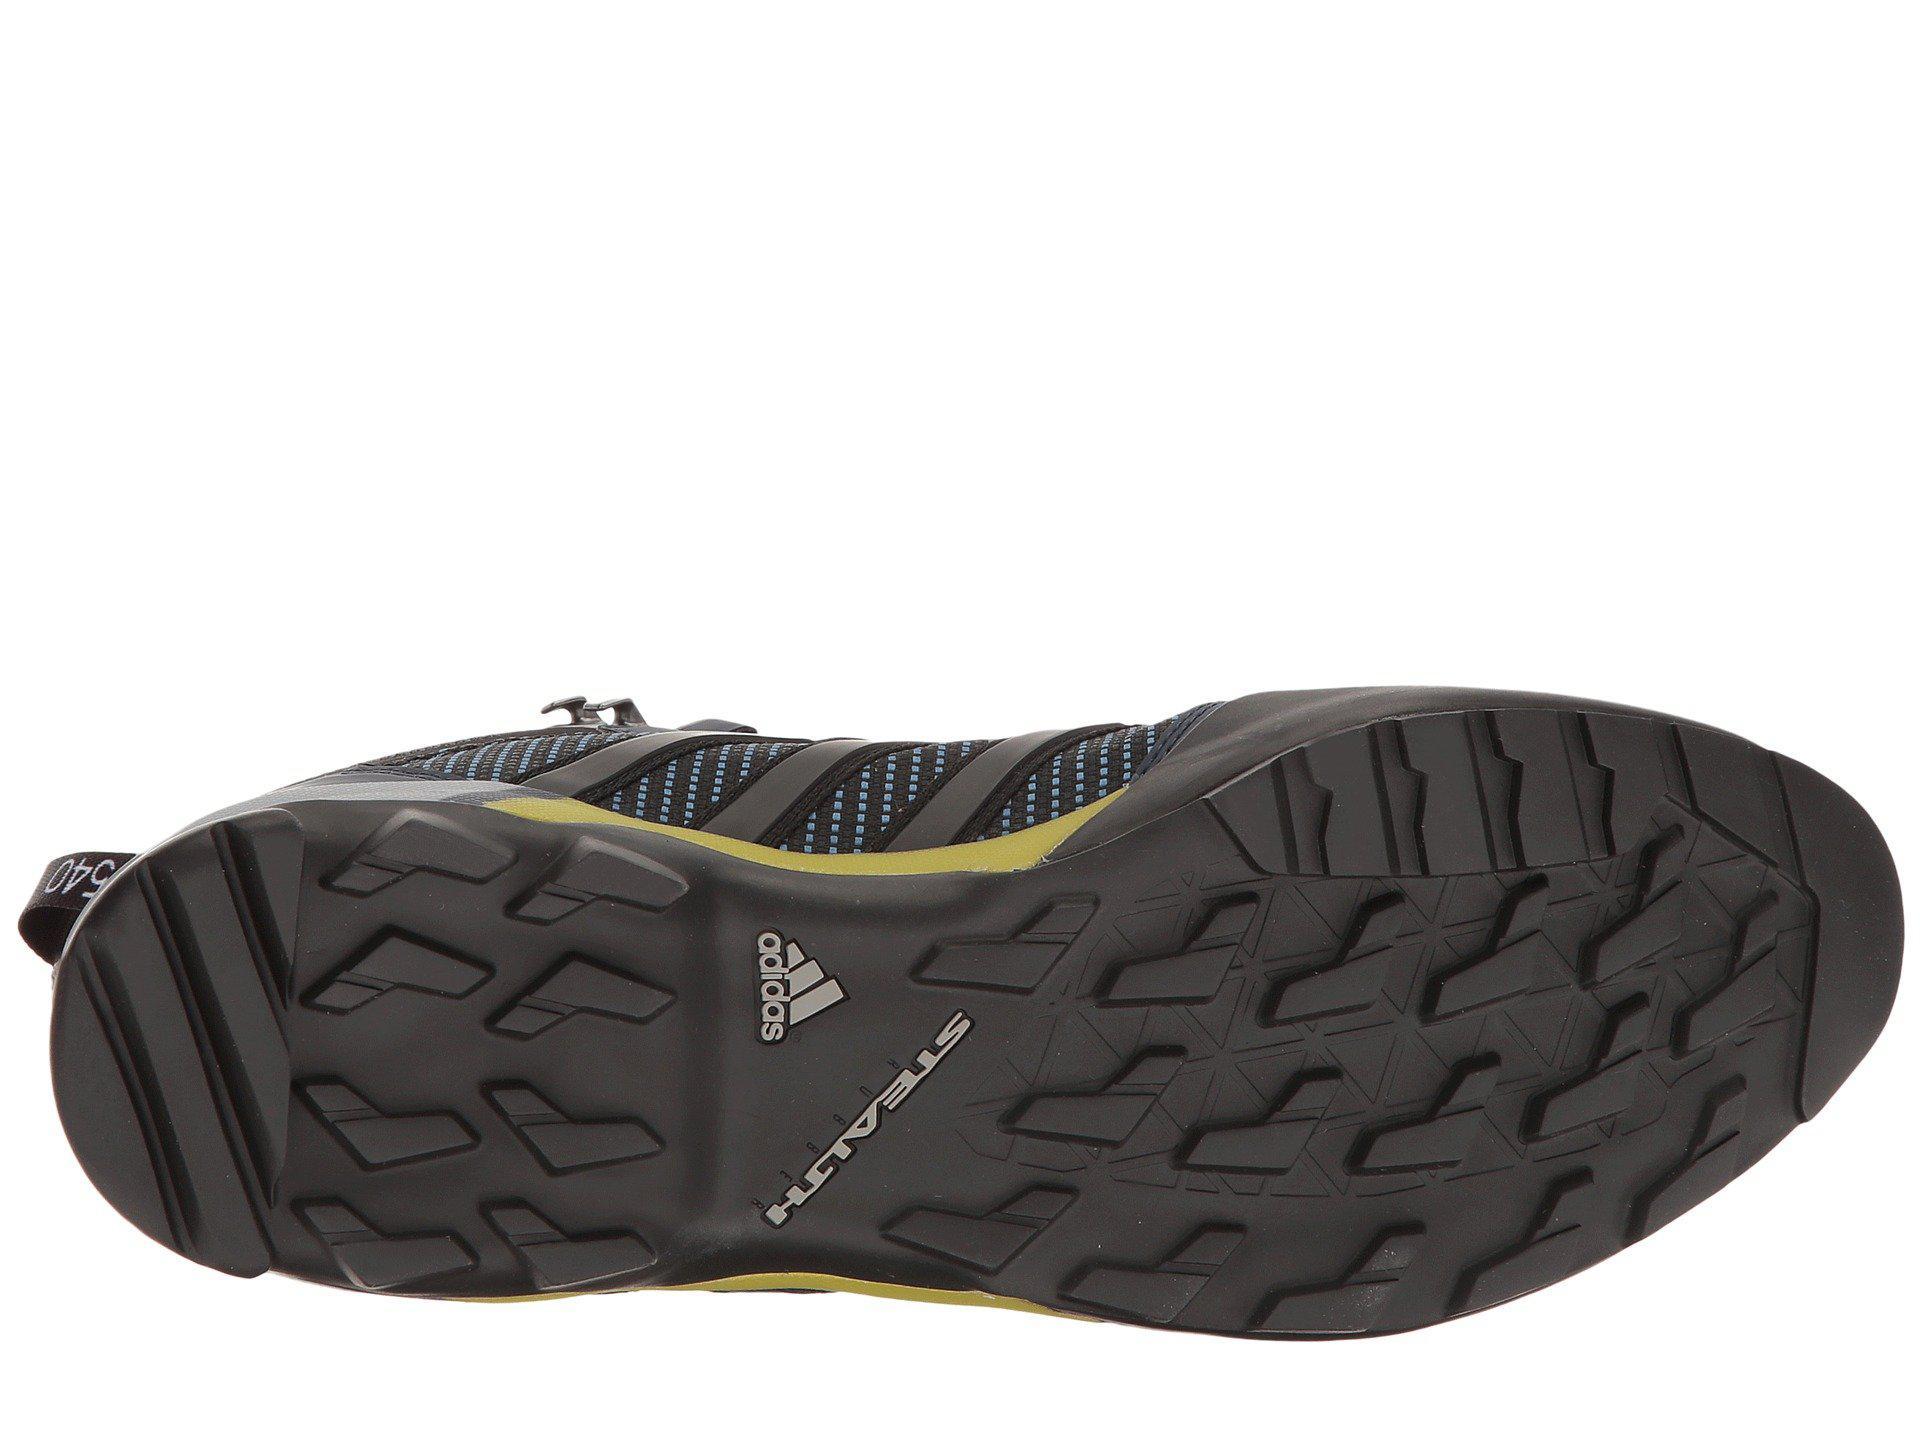 5709e46e4cb Lyst - adidas Originals Terrex Scope High Gtx (core Blue black ...